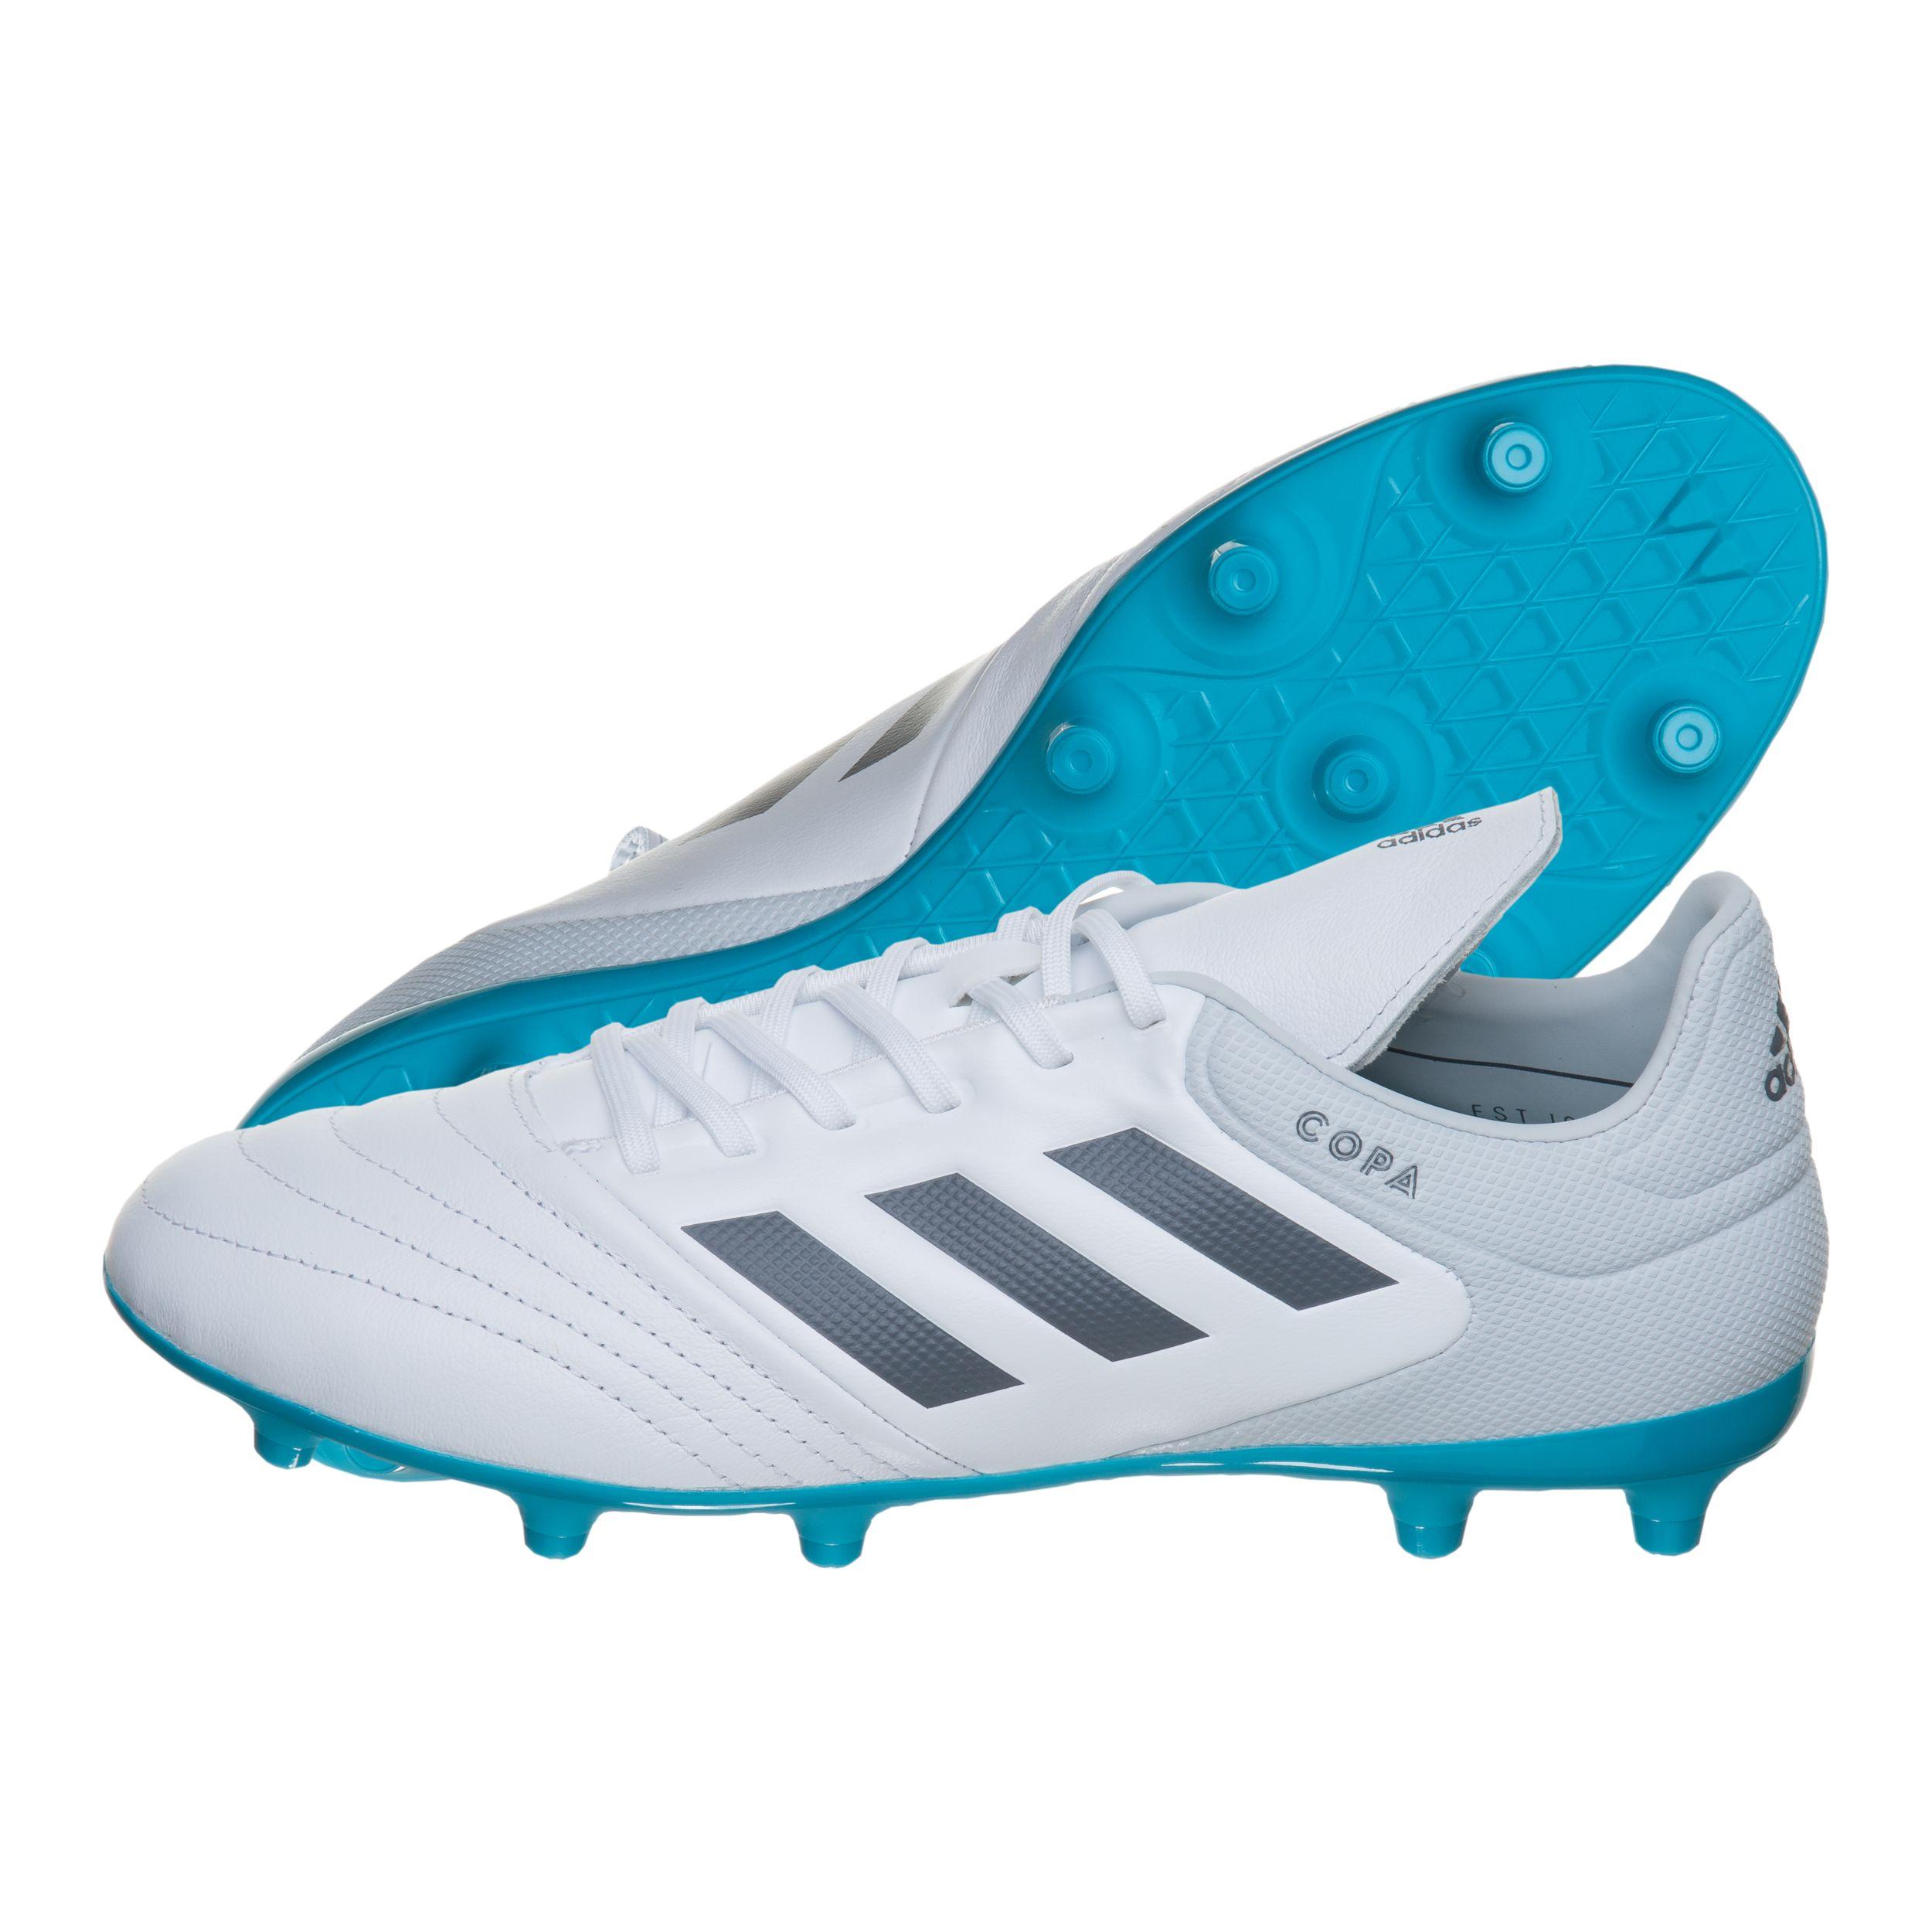 online store 878ad 8692b Teamsport Philipp  Adidas Copa 17.3 FG S77141  günstig onlin